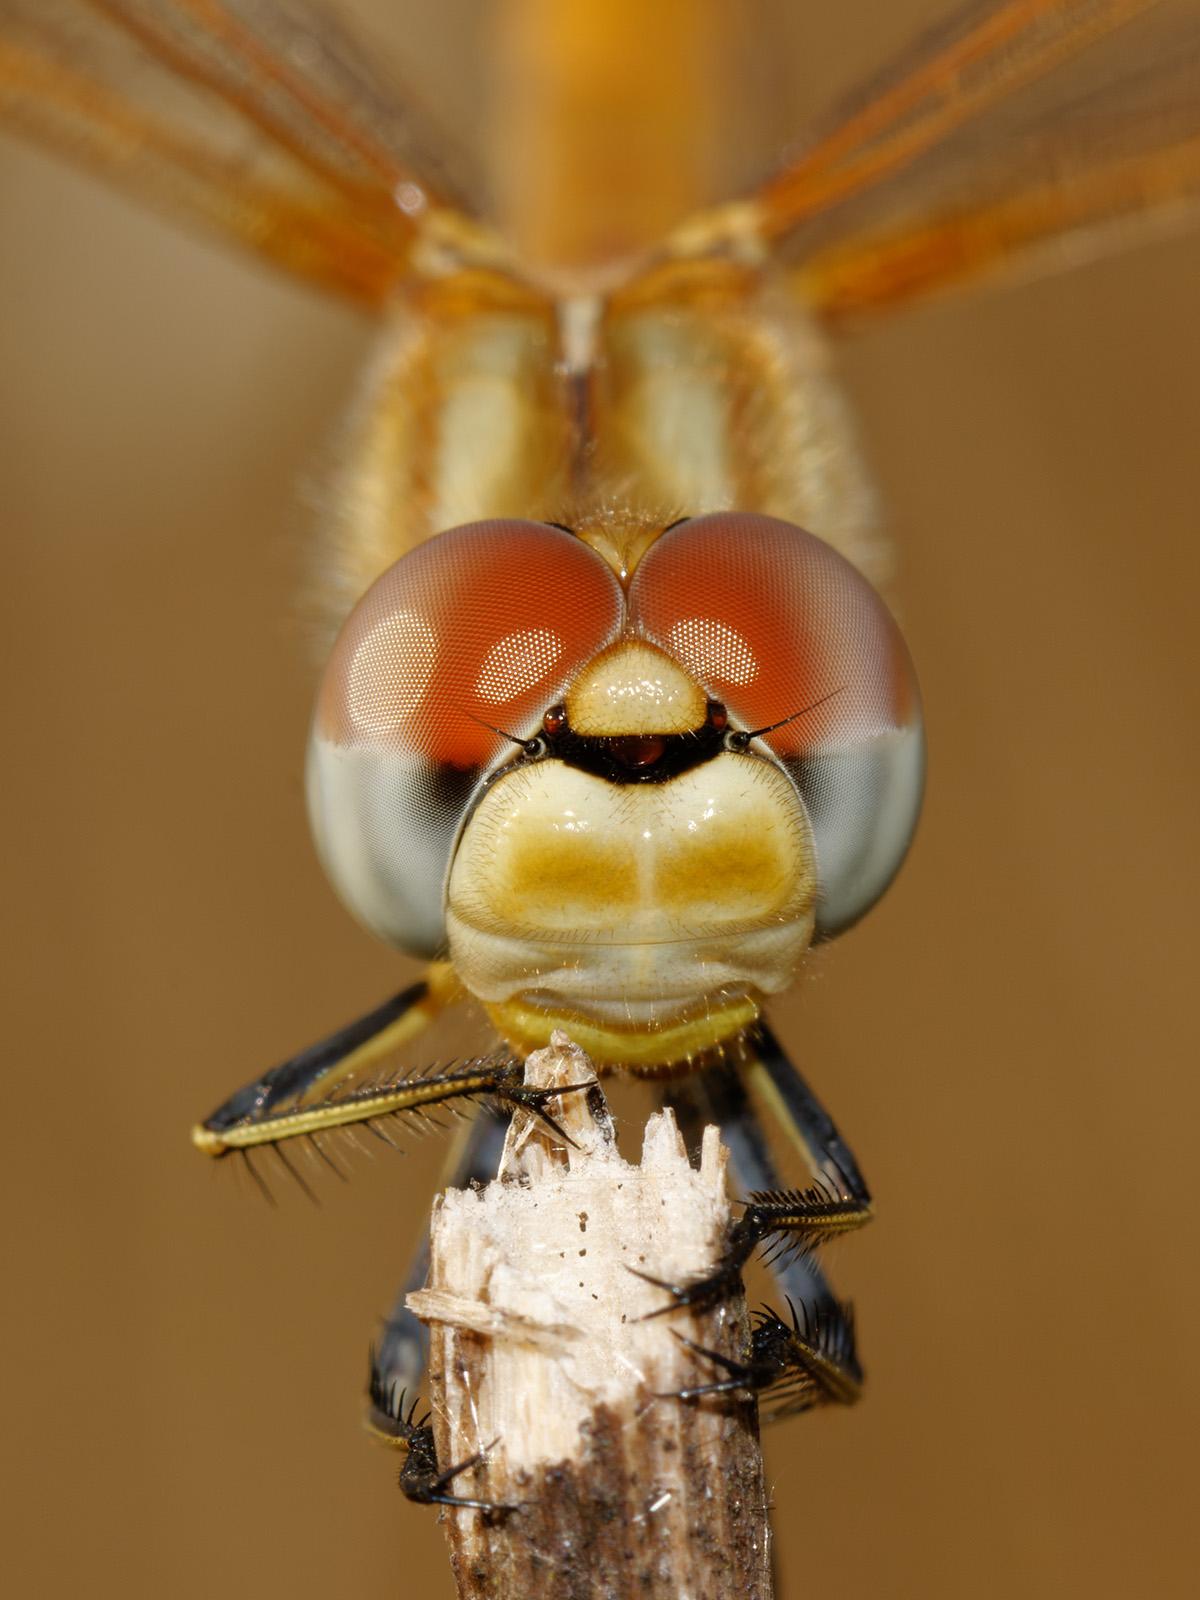 Sympetrum fonscolombii, immature male